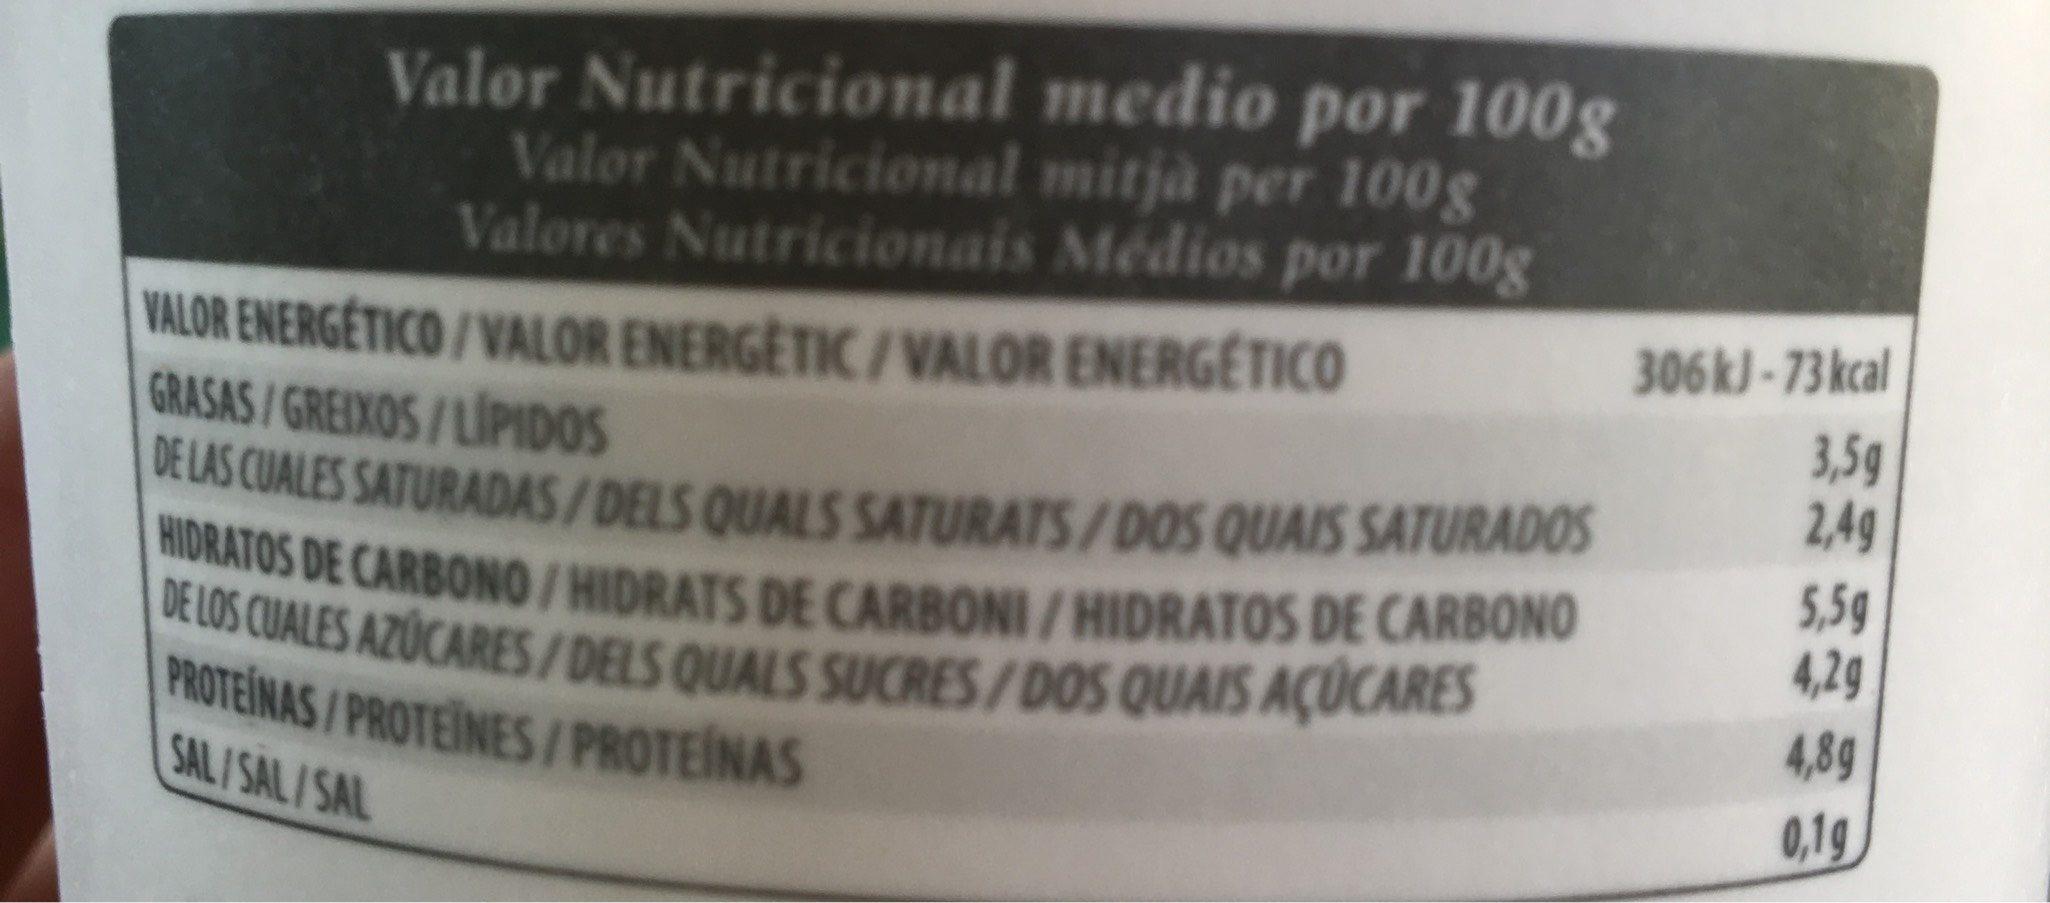 Yogur natural artesanal - Información nutricional - fr